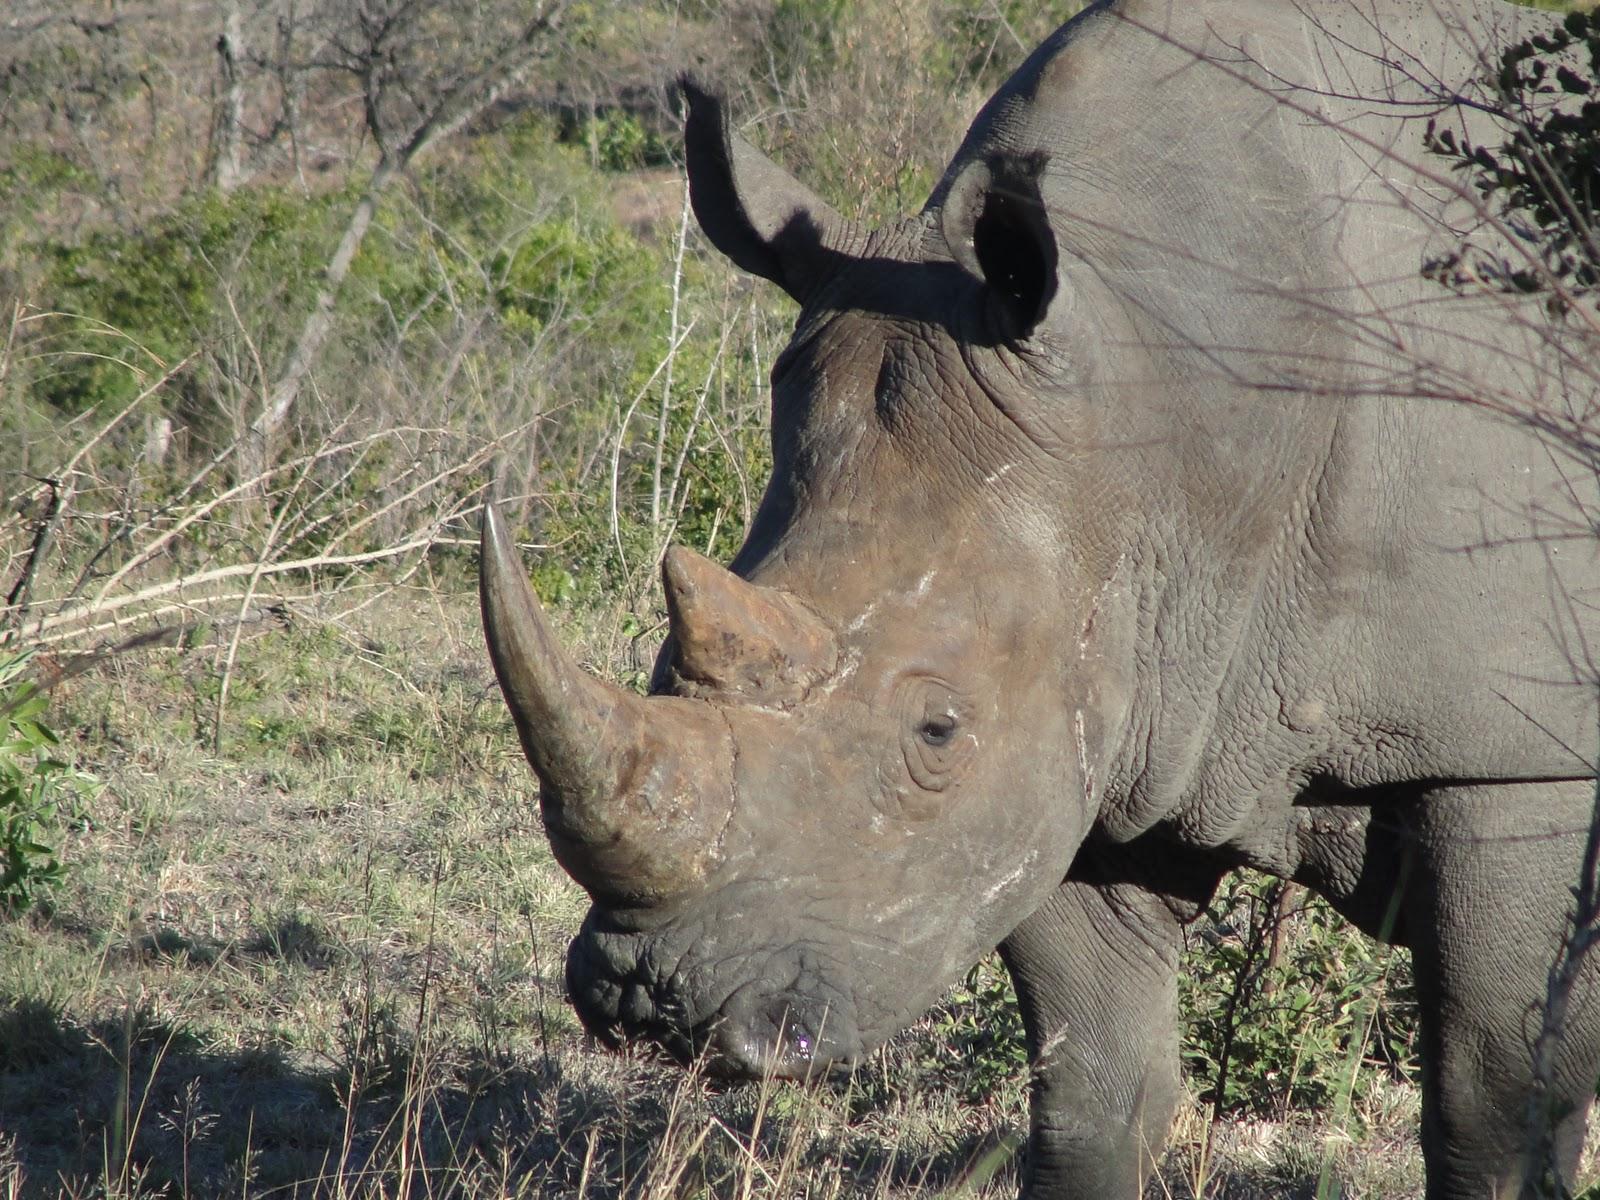 Tshokwane Safaris